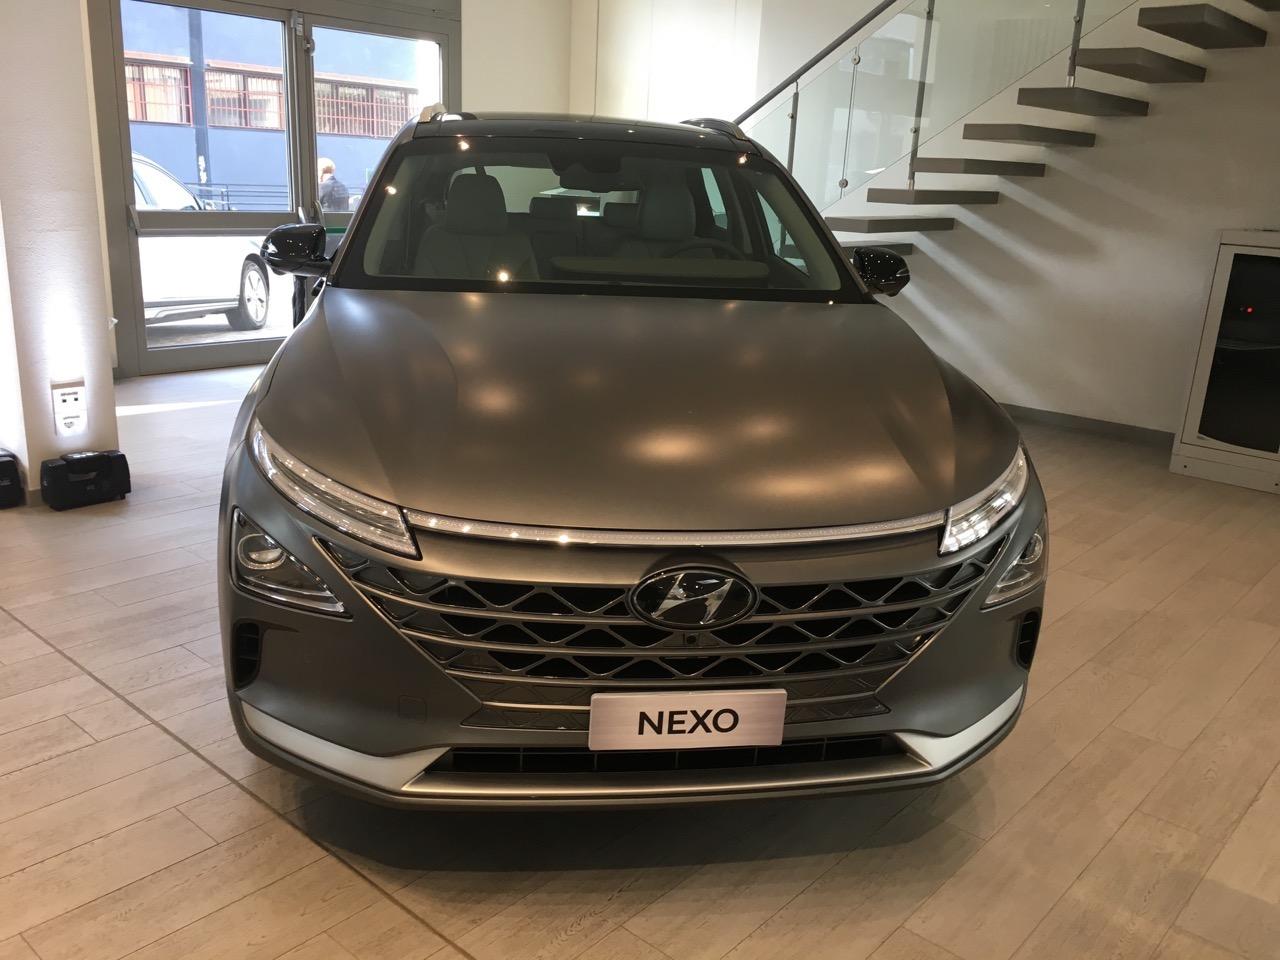 Hyundai Next Awaits - Milano